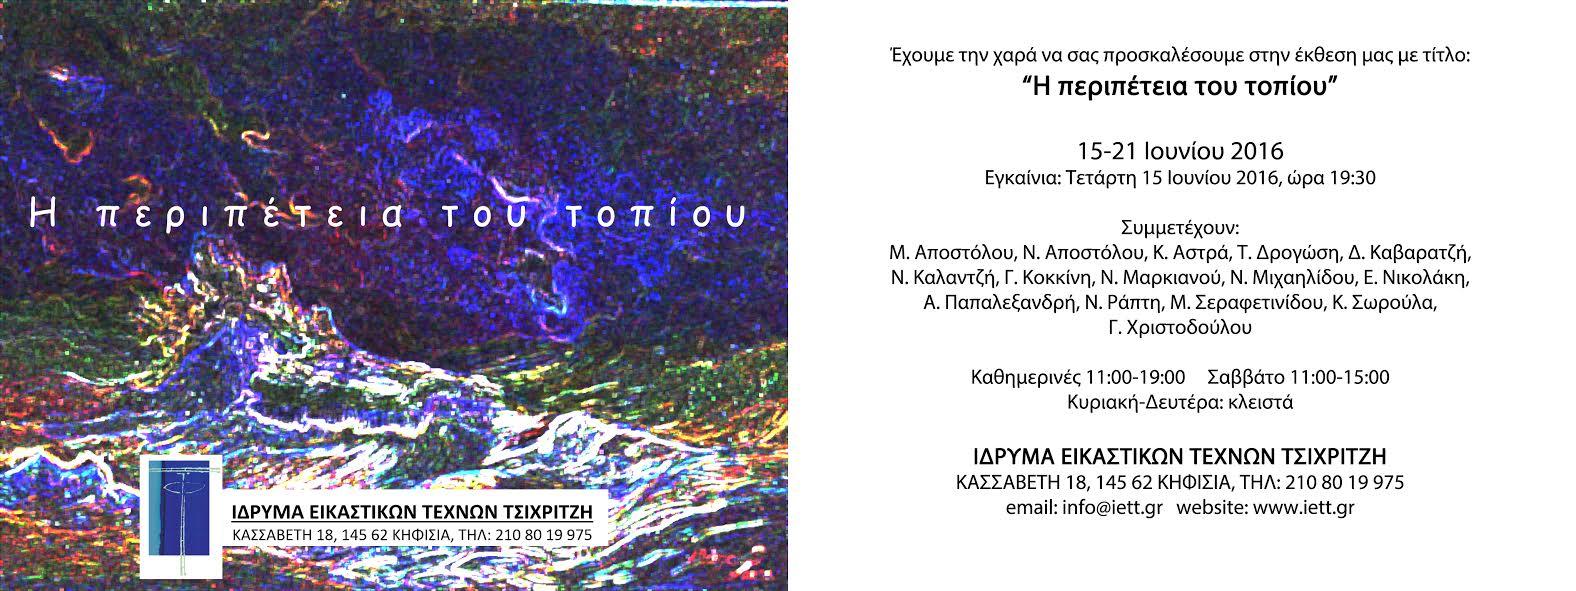 Tsichritzis Visual Arts Foundation